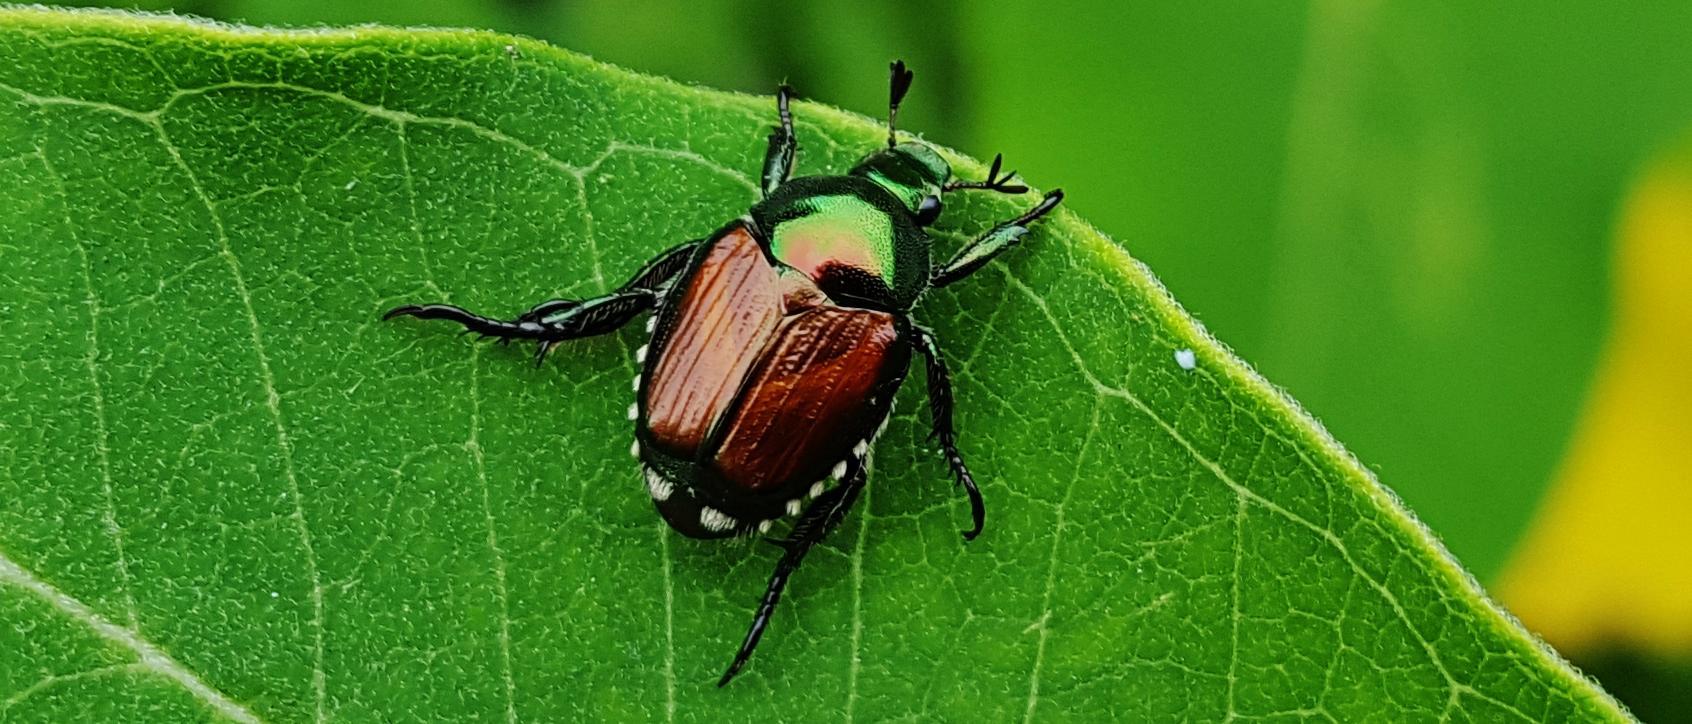 Japanese beetle. View Slideshow 1 of 3